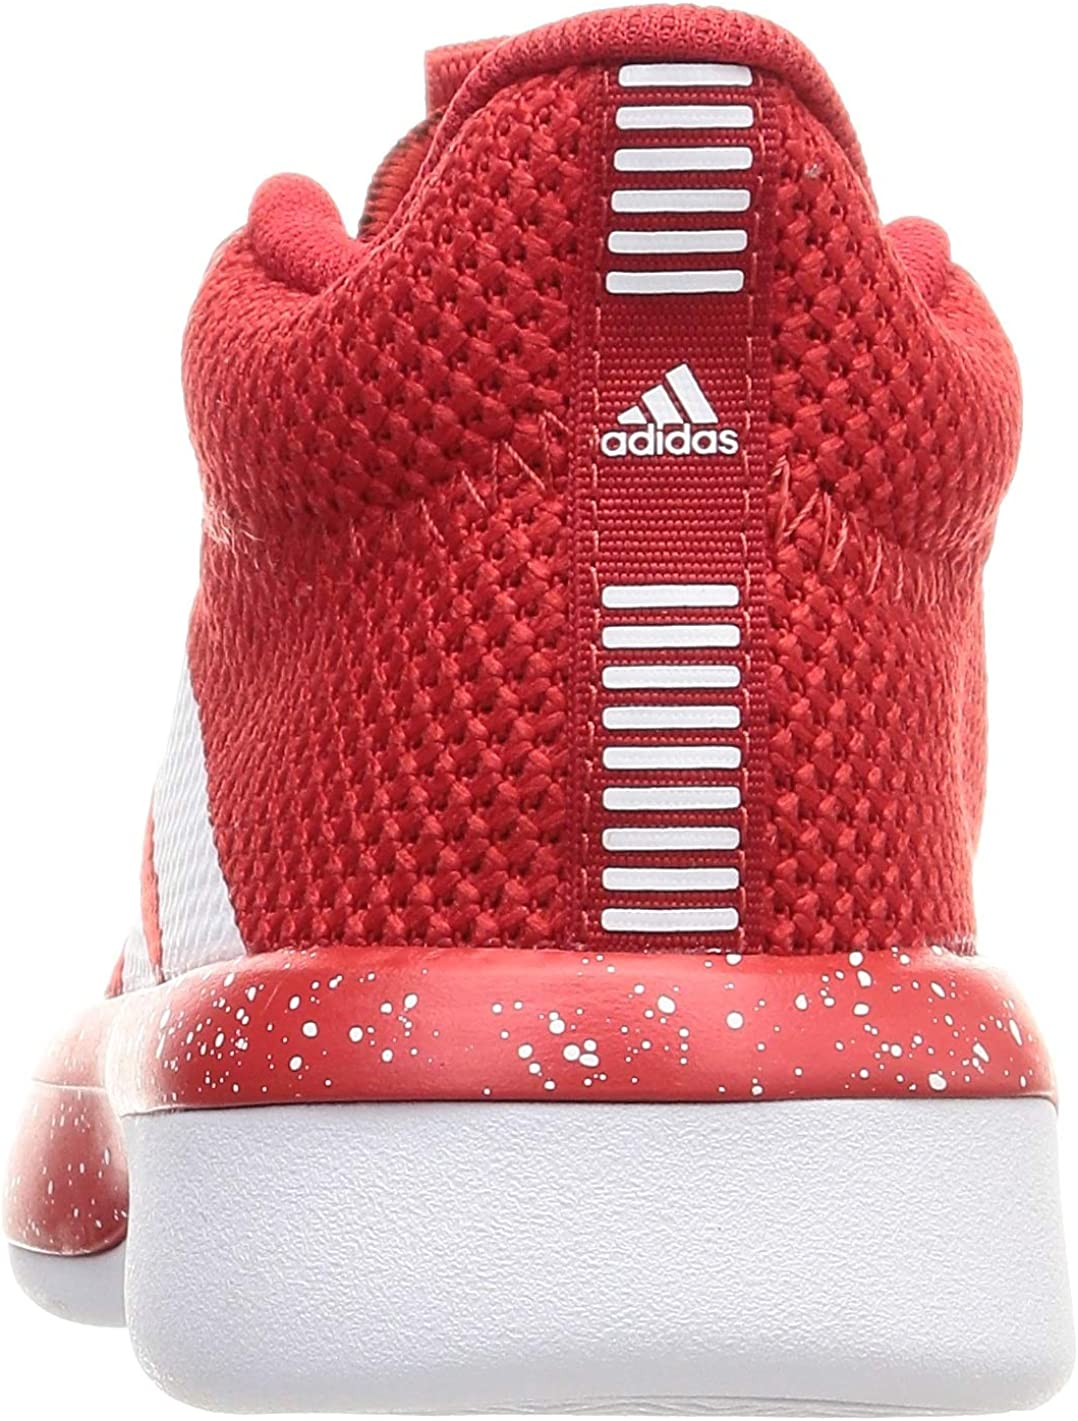 adidas Pro Next 2019 K Zapatillas Baloncesto Infantil Unisex beb/é